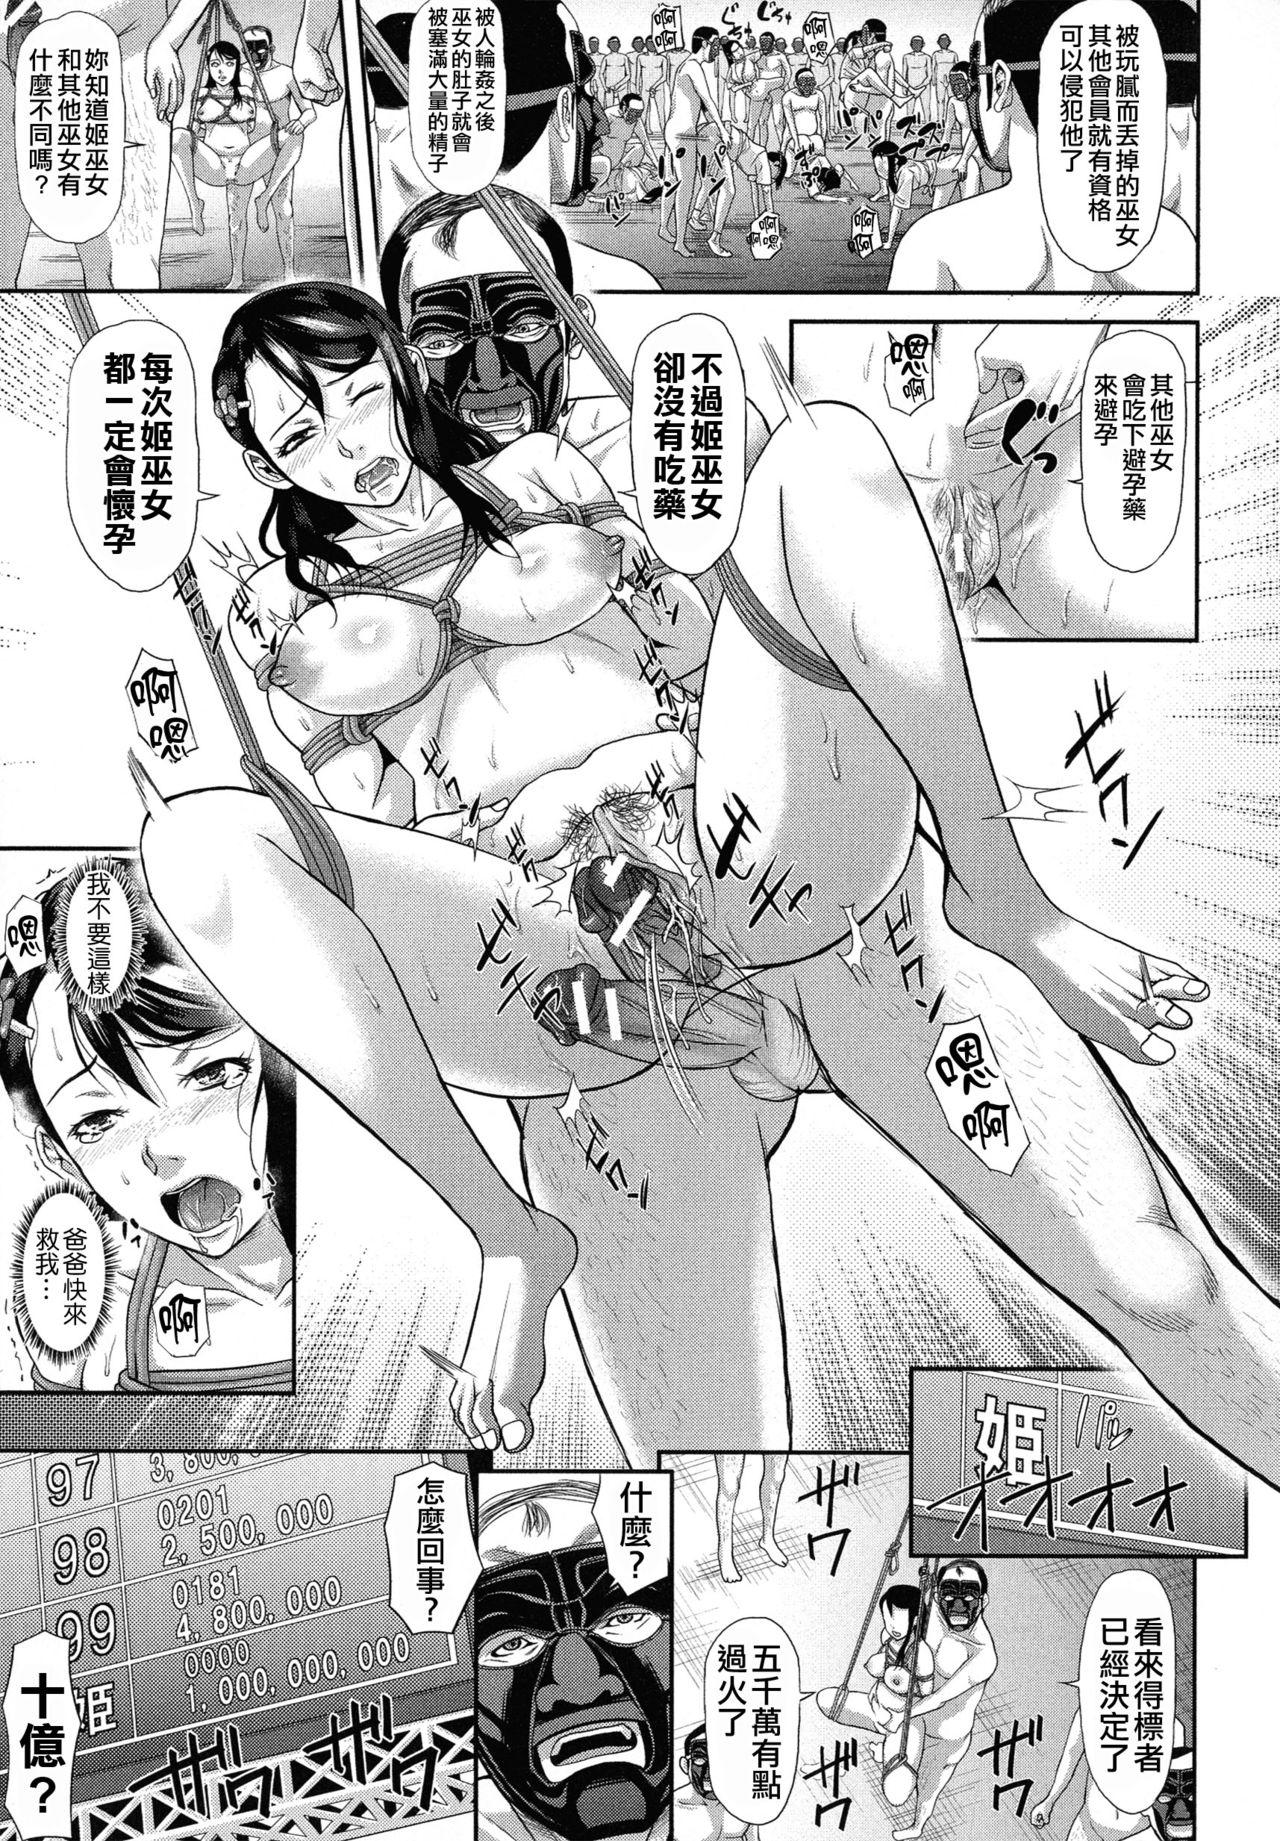 [Honebuto Danshaku] Innou Kaizou Program ~Oyako Zecchou Cult Ochi~ [Chinese]【不想记名重嵌--高质量图源】 191